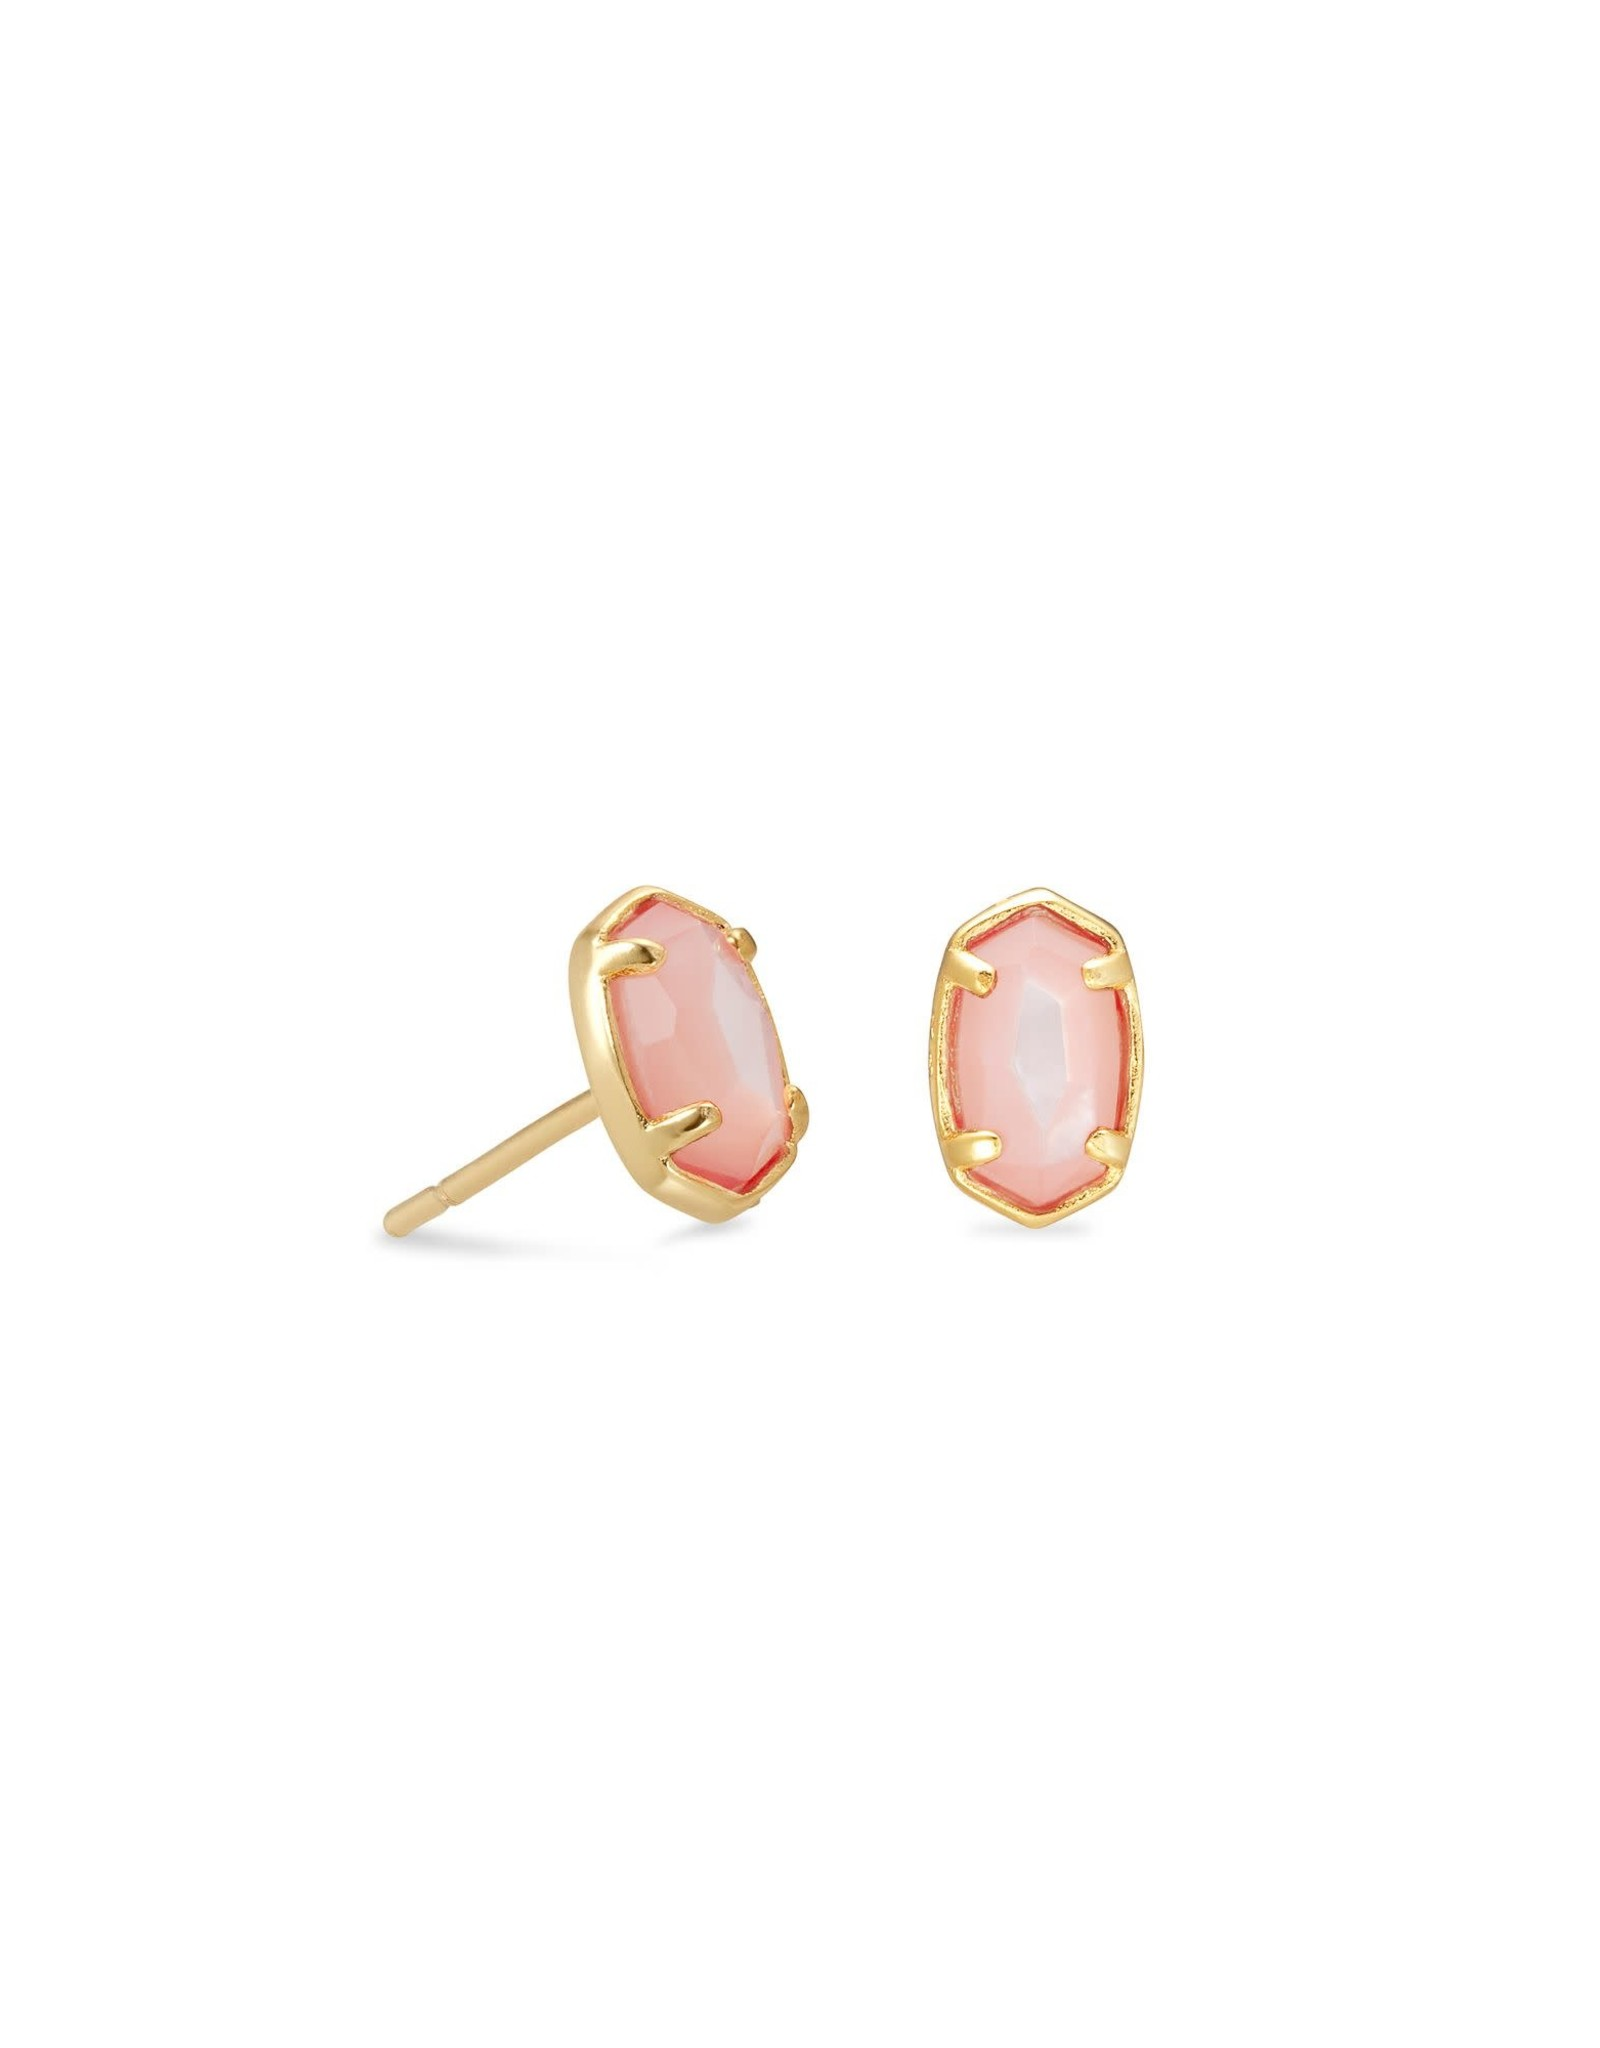 Kendra Scott Emilie Stud Earring - Rose MOP/Gold